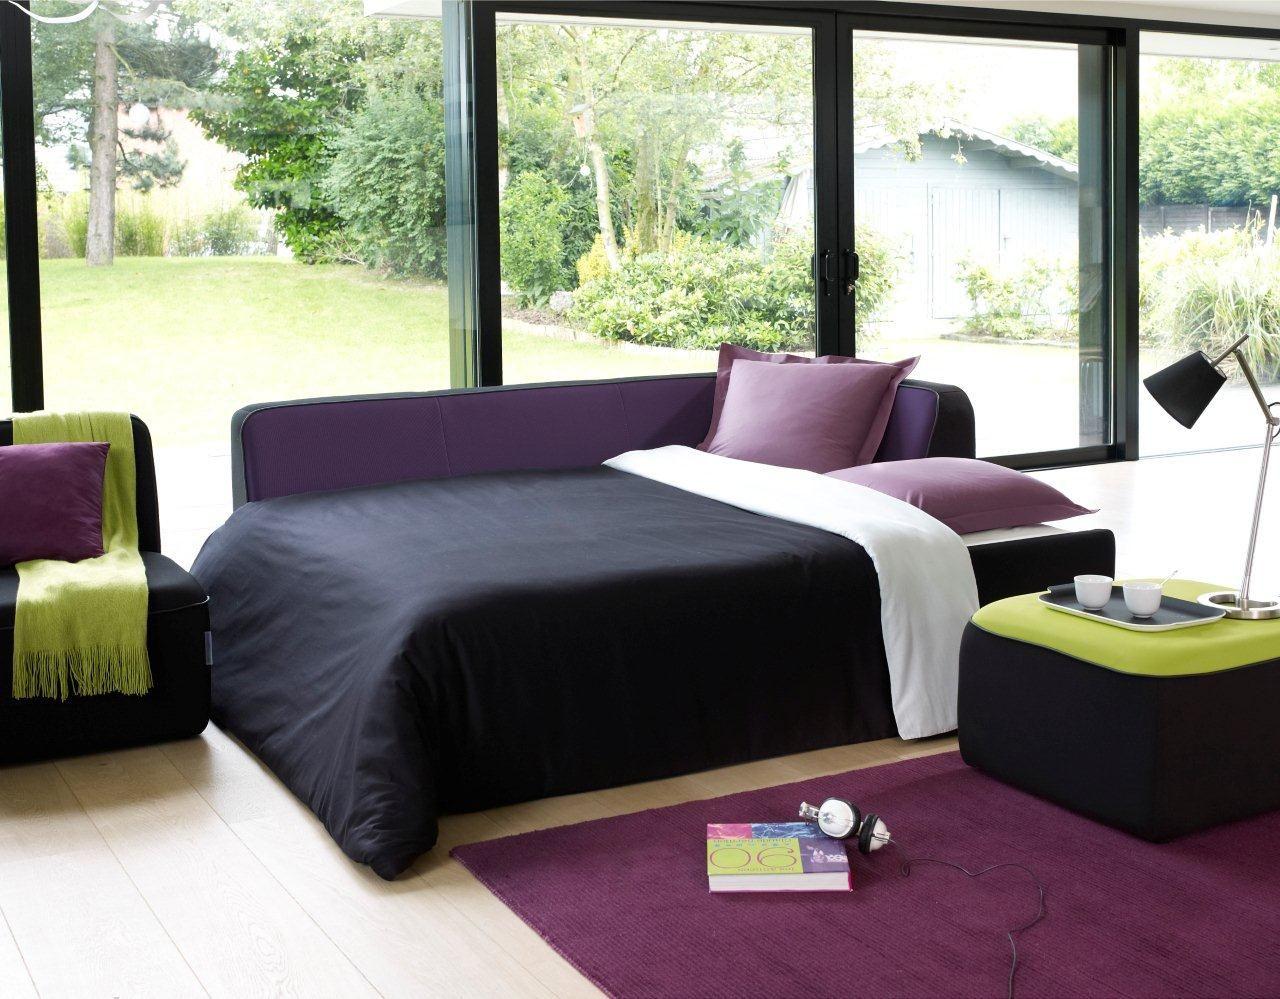 pouf e motion by ora ito 62 x 62 cm noir rouge. Black Bedroom Furniture Sets. Home Design Ideas